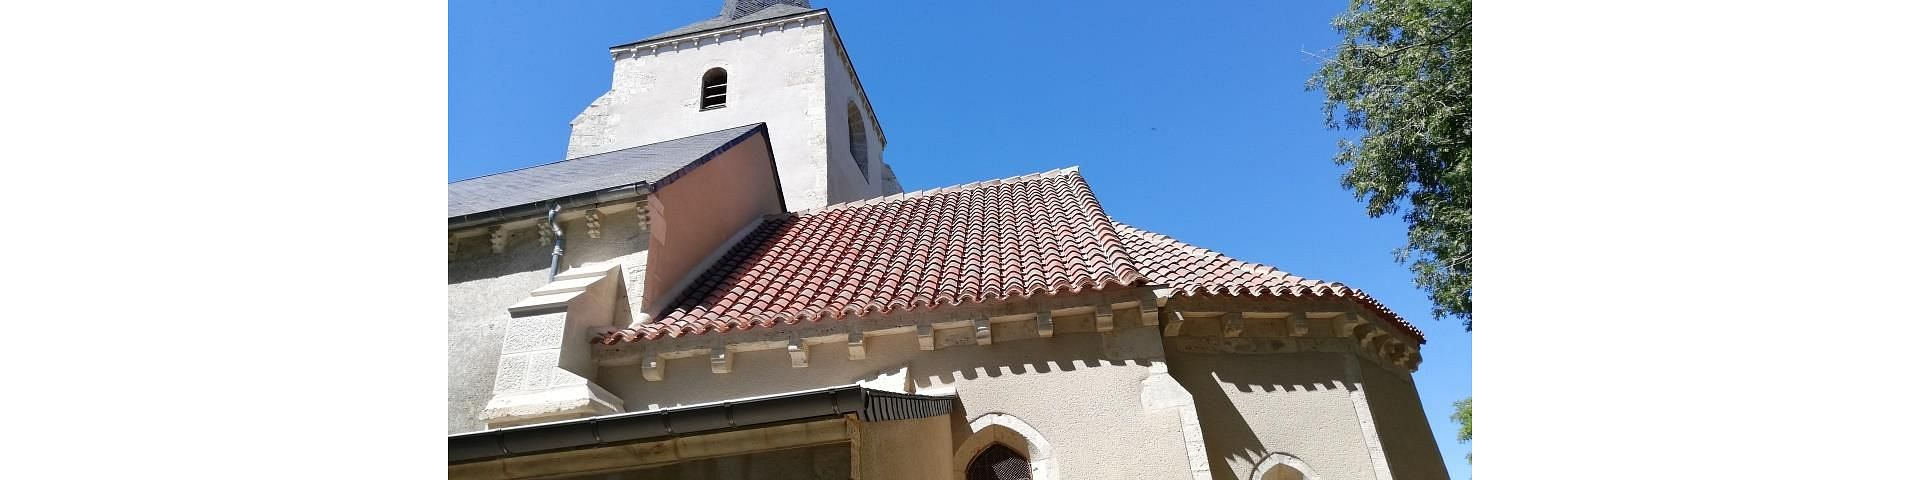 Authiou - Eglise St-Sulpice (58)